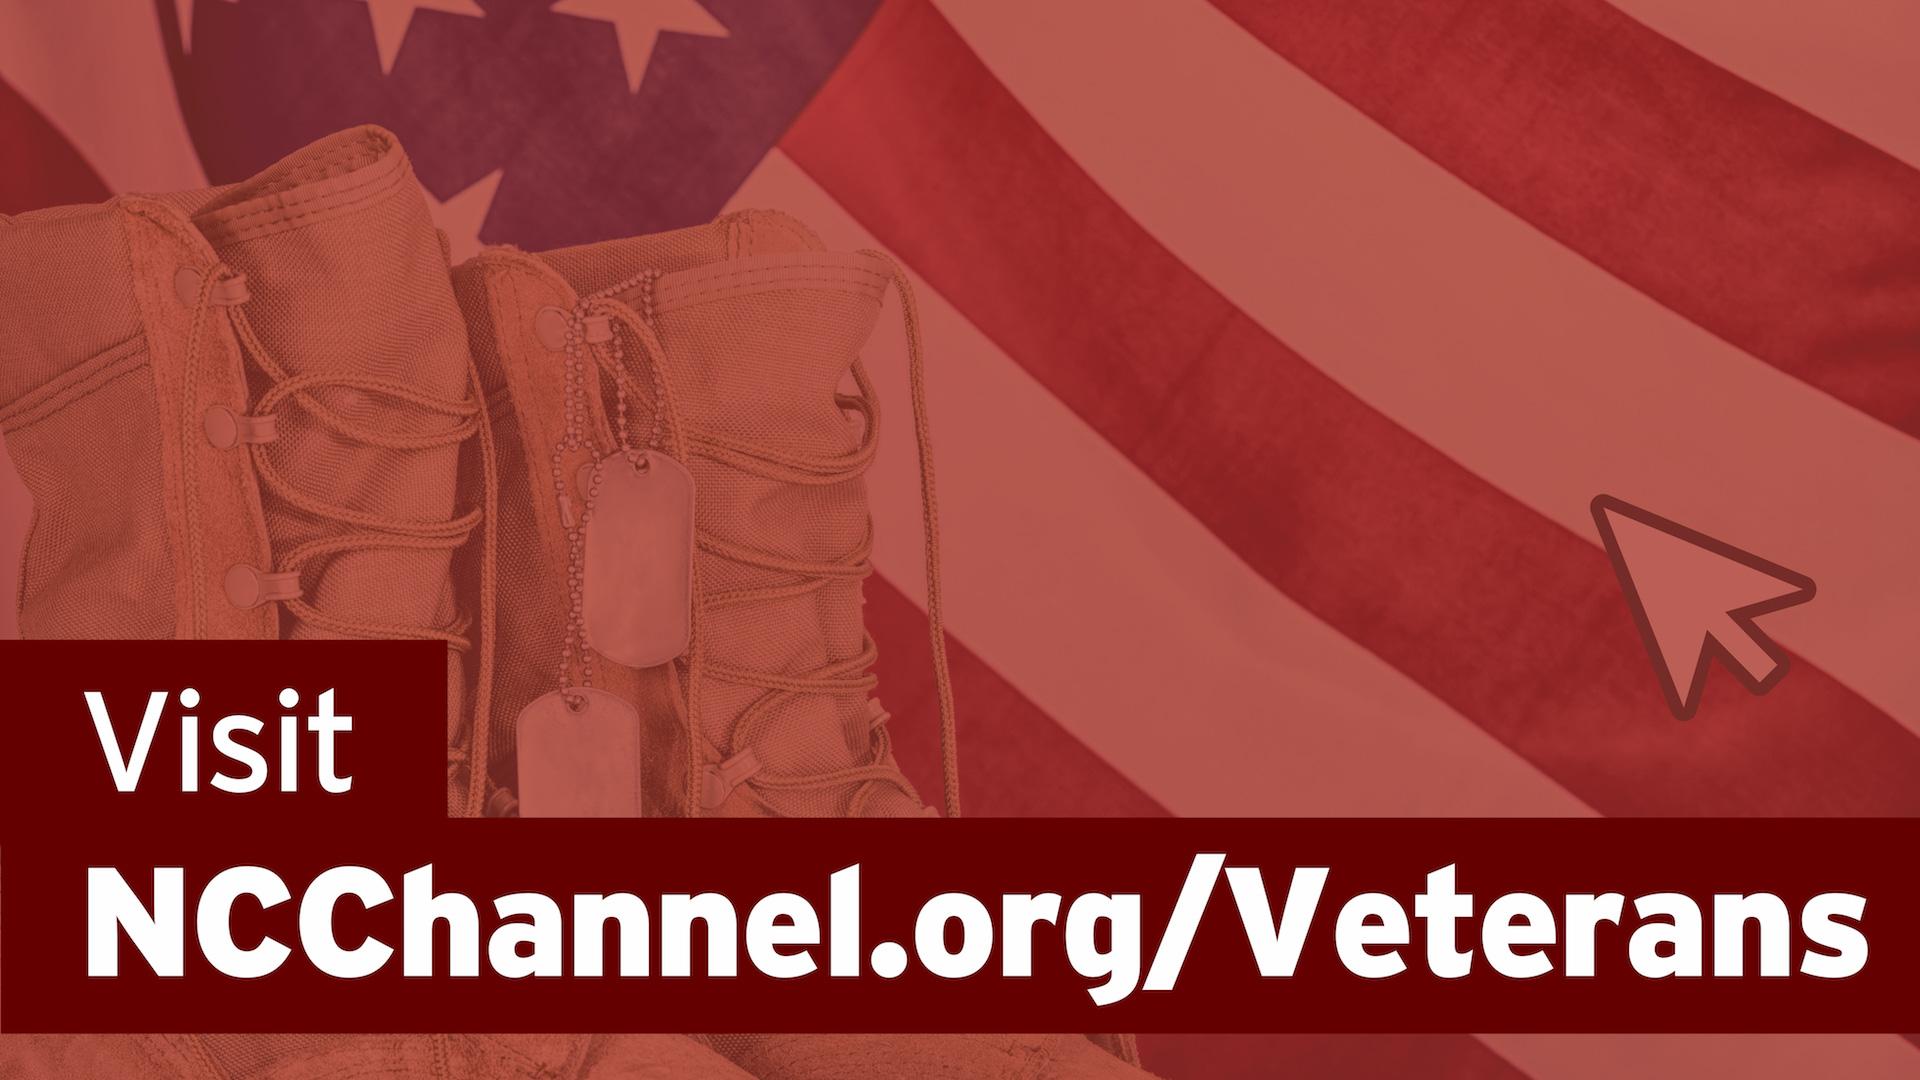 Visit ncchannel.org/veterans